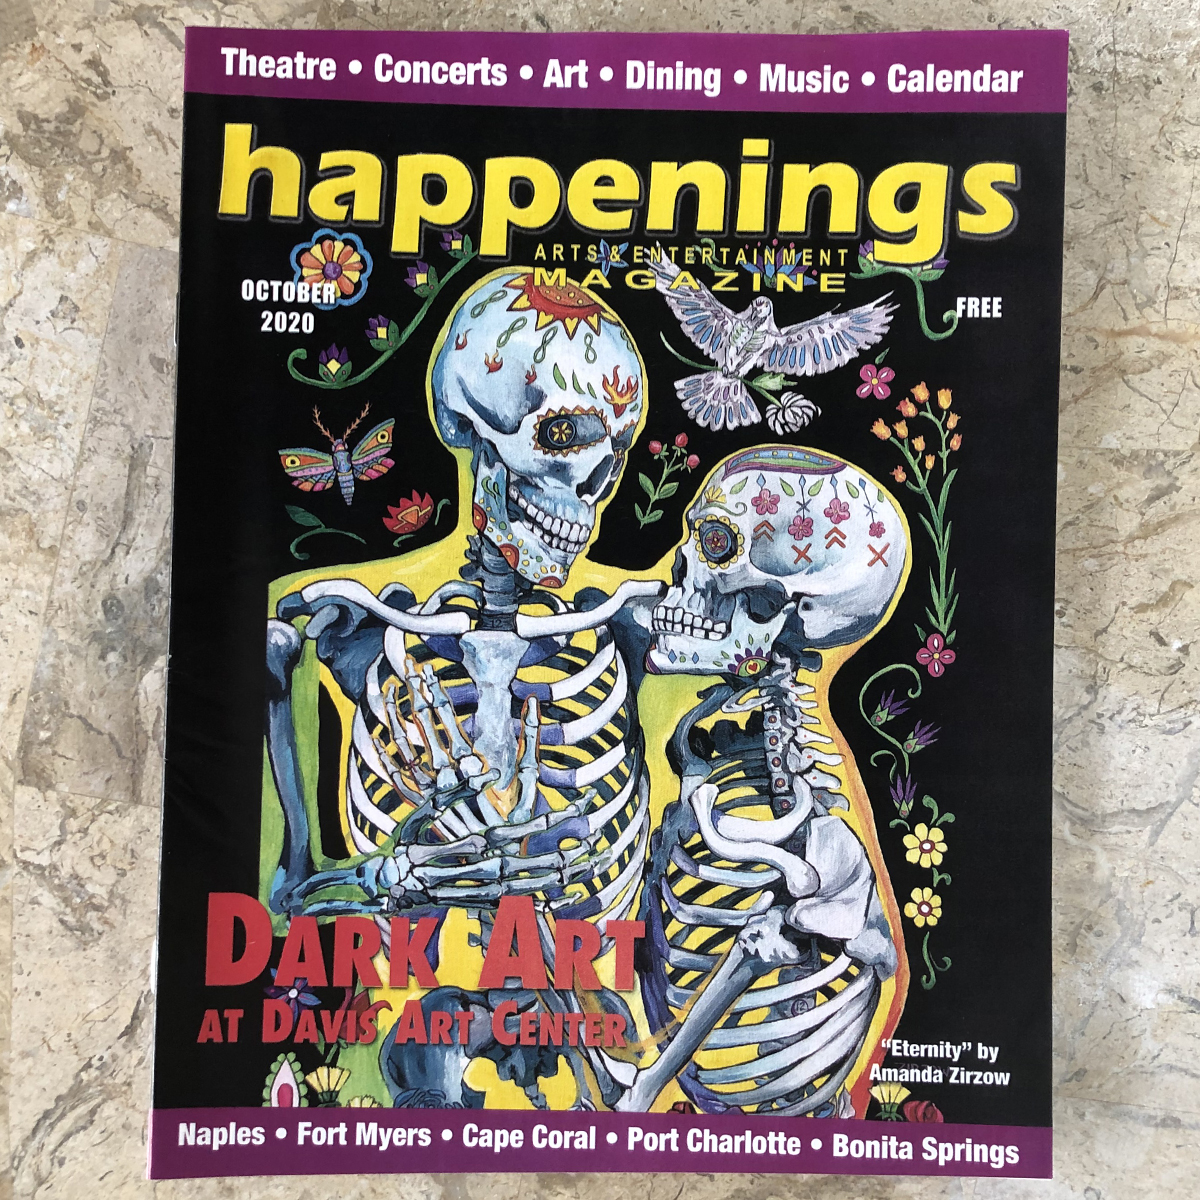 Amanda Zirzow Art Featured on Happenings Magazine